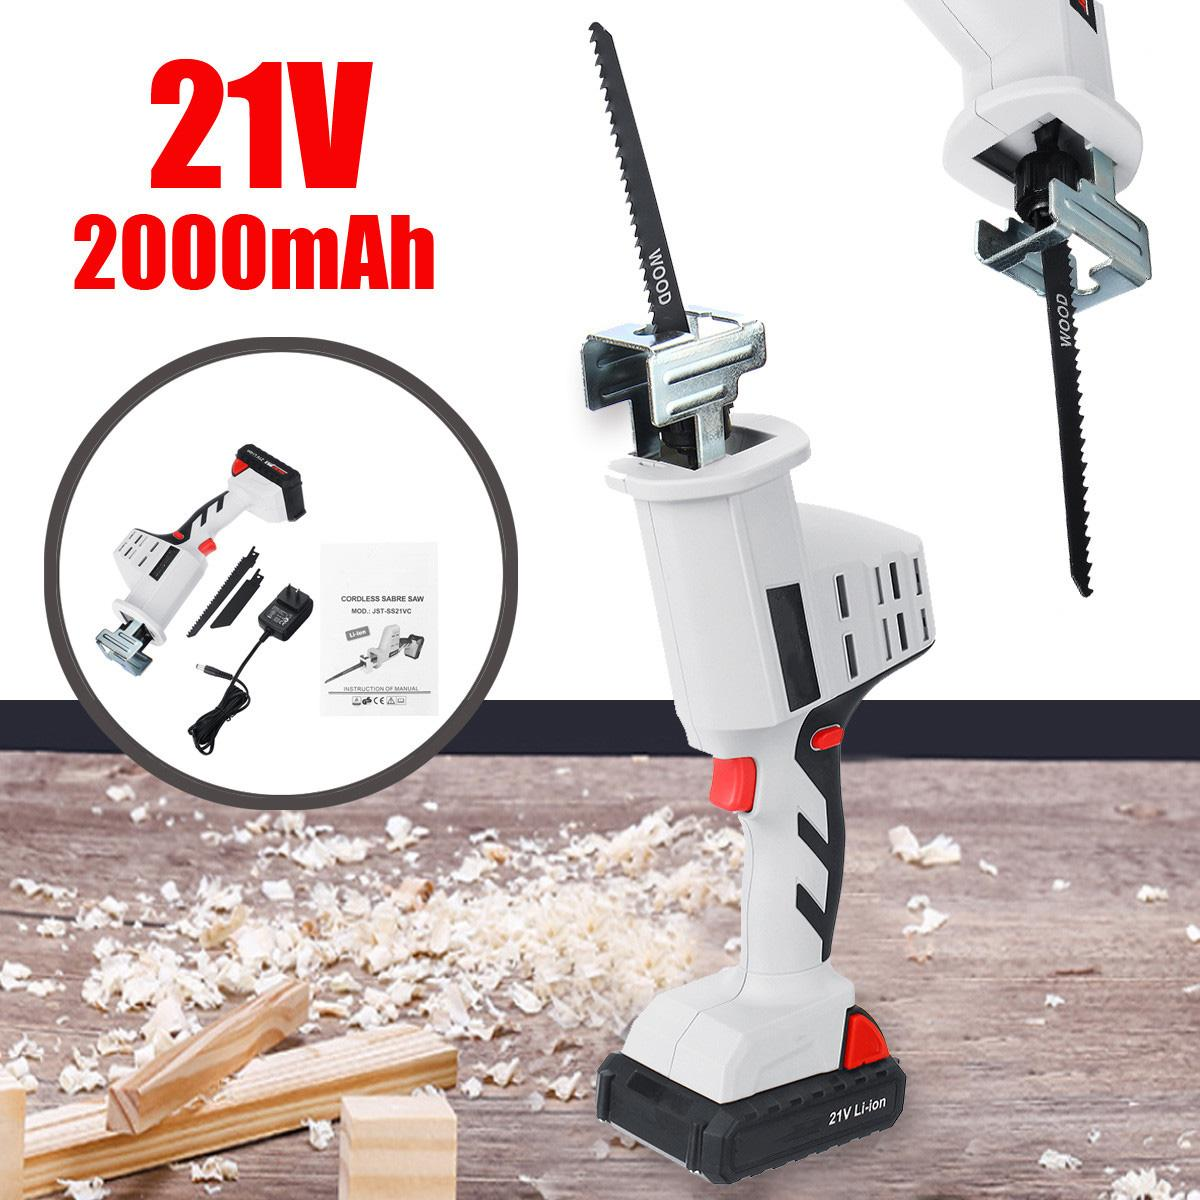 21V Li Ion 1500/2000/4000mAh Cordless Reciprocating Saw Kit Portable Charging Electric Saw with 1500mAh Li Ion Battery